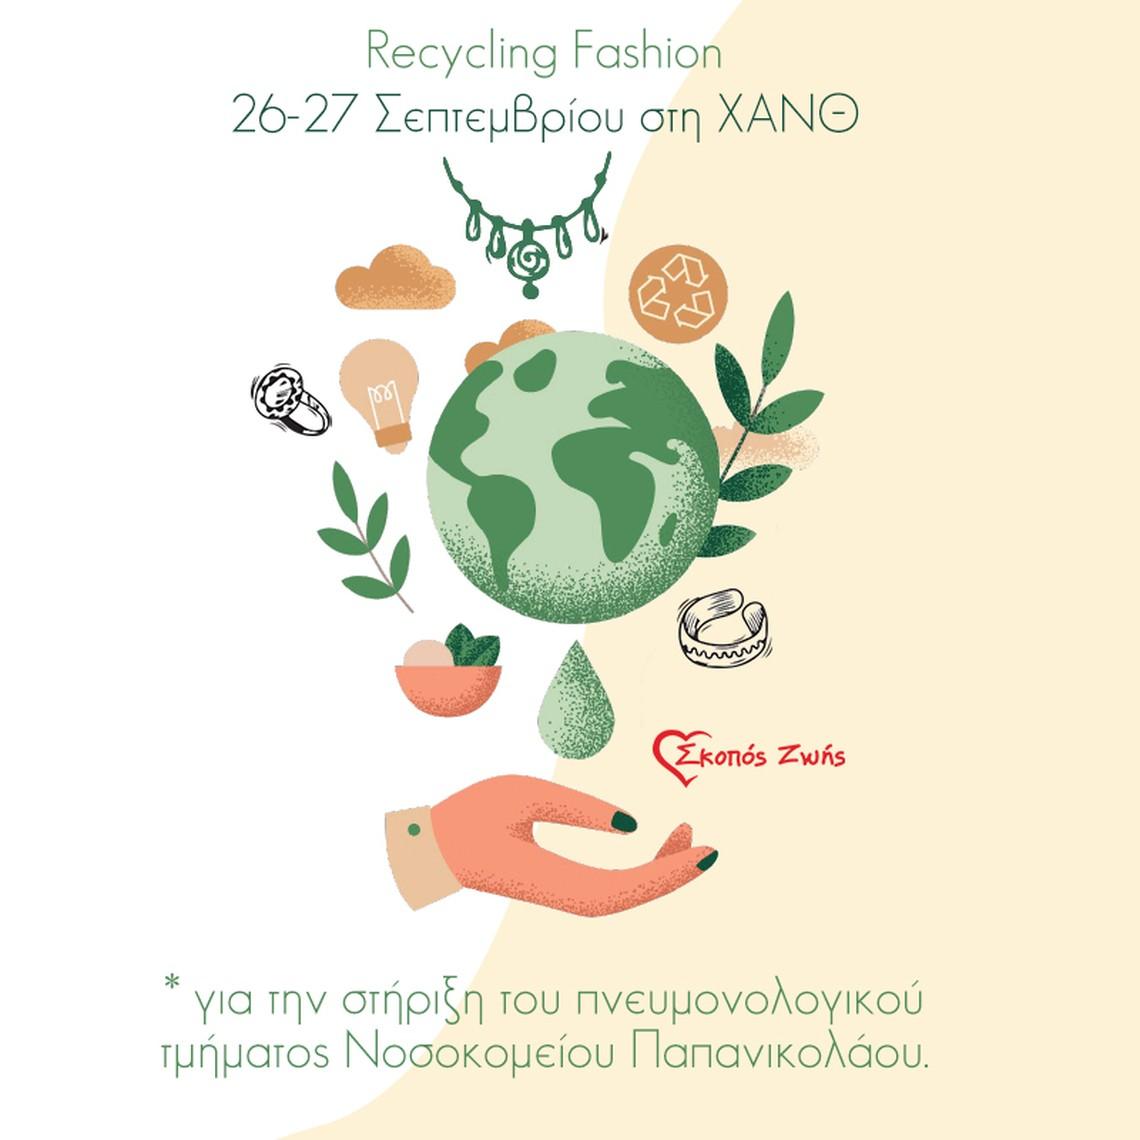 Recycling Fashion στο Αίθριο της ΧΑΝΘ